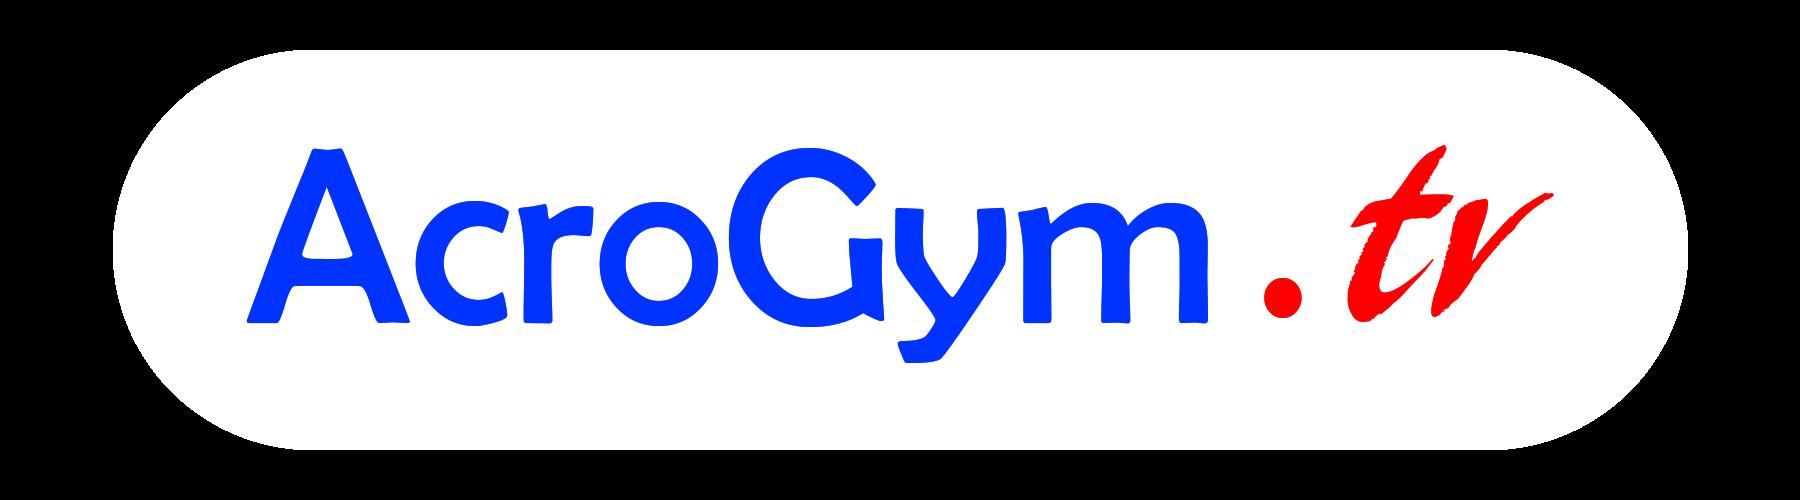 AcroGym.tv